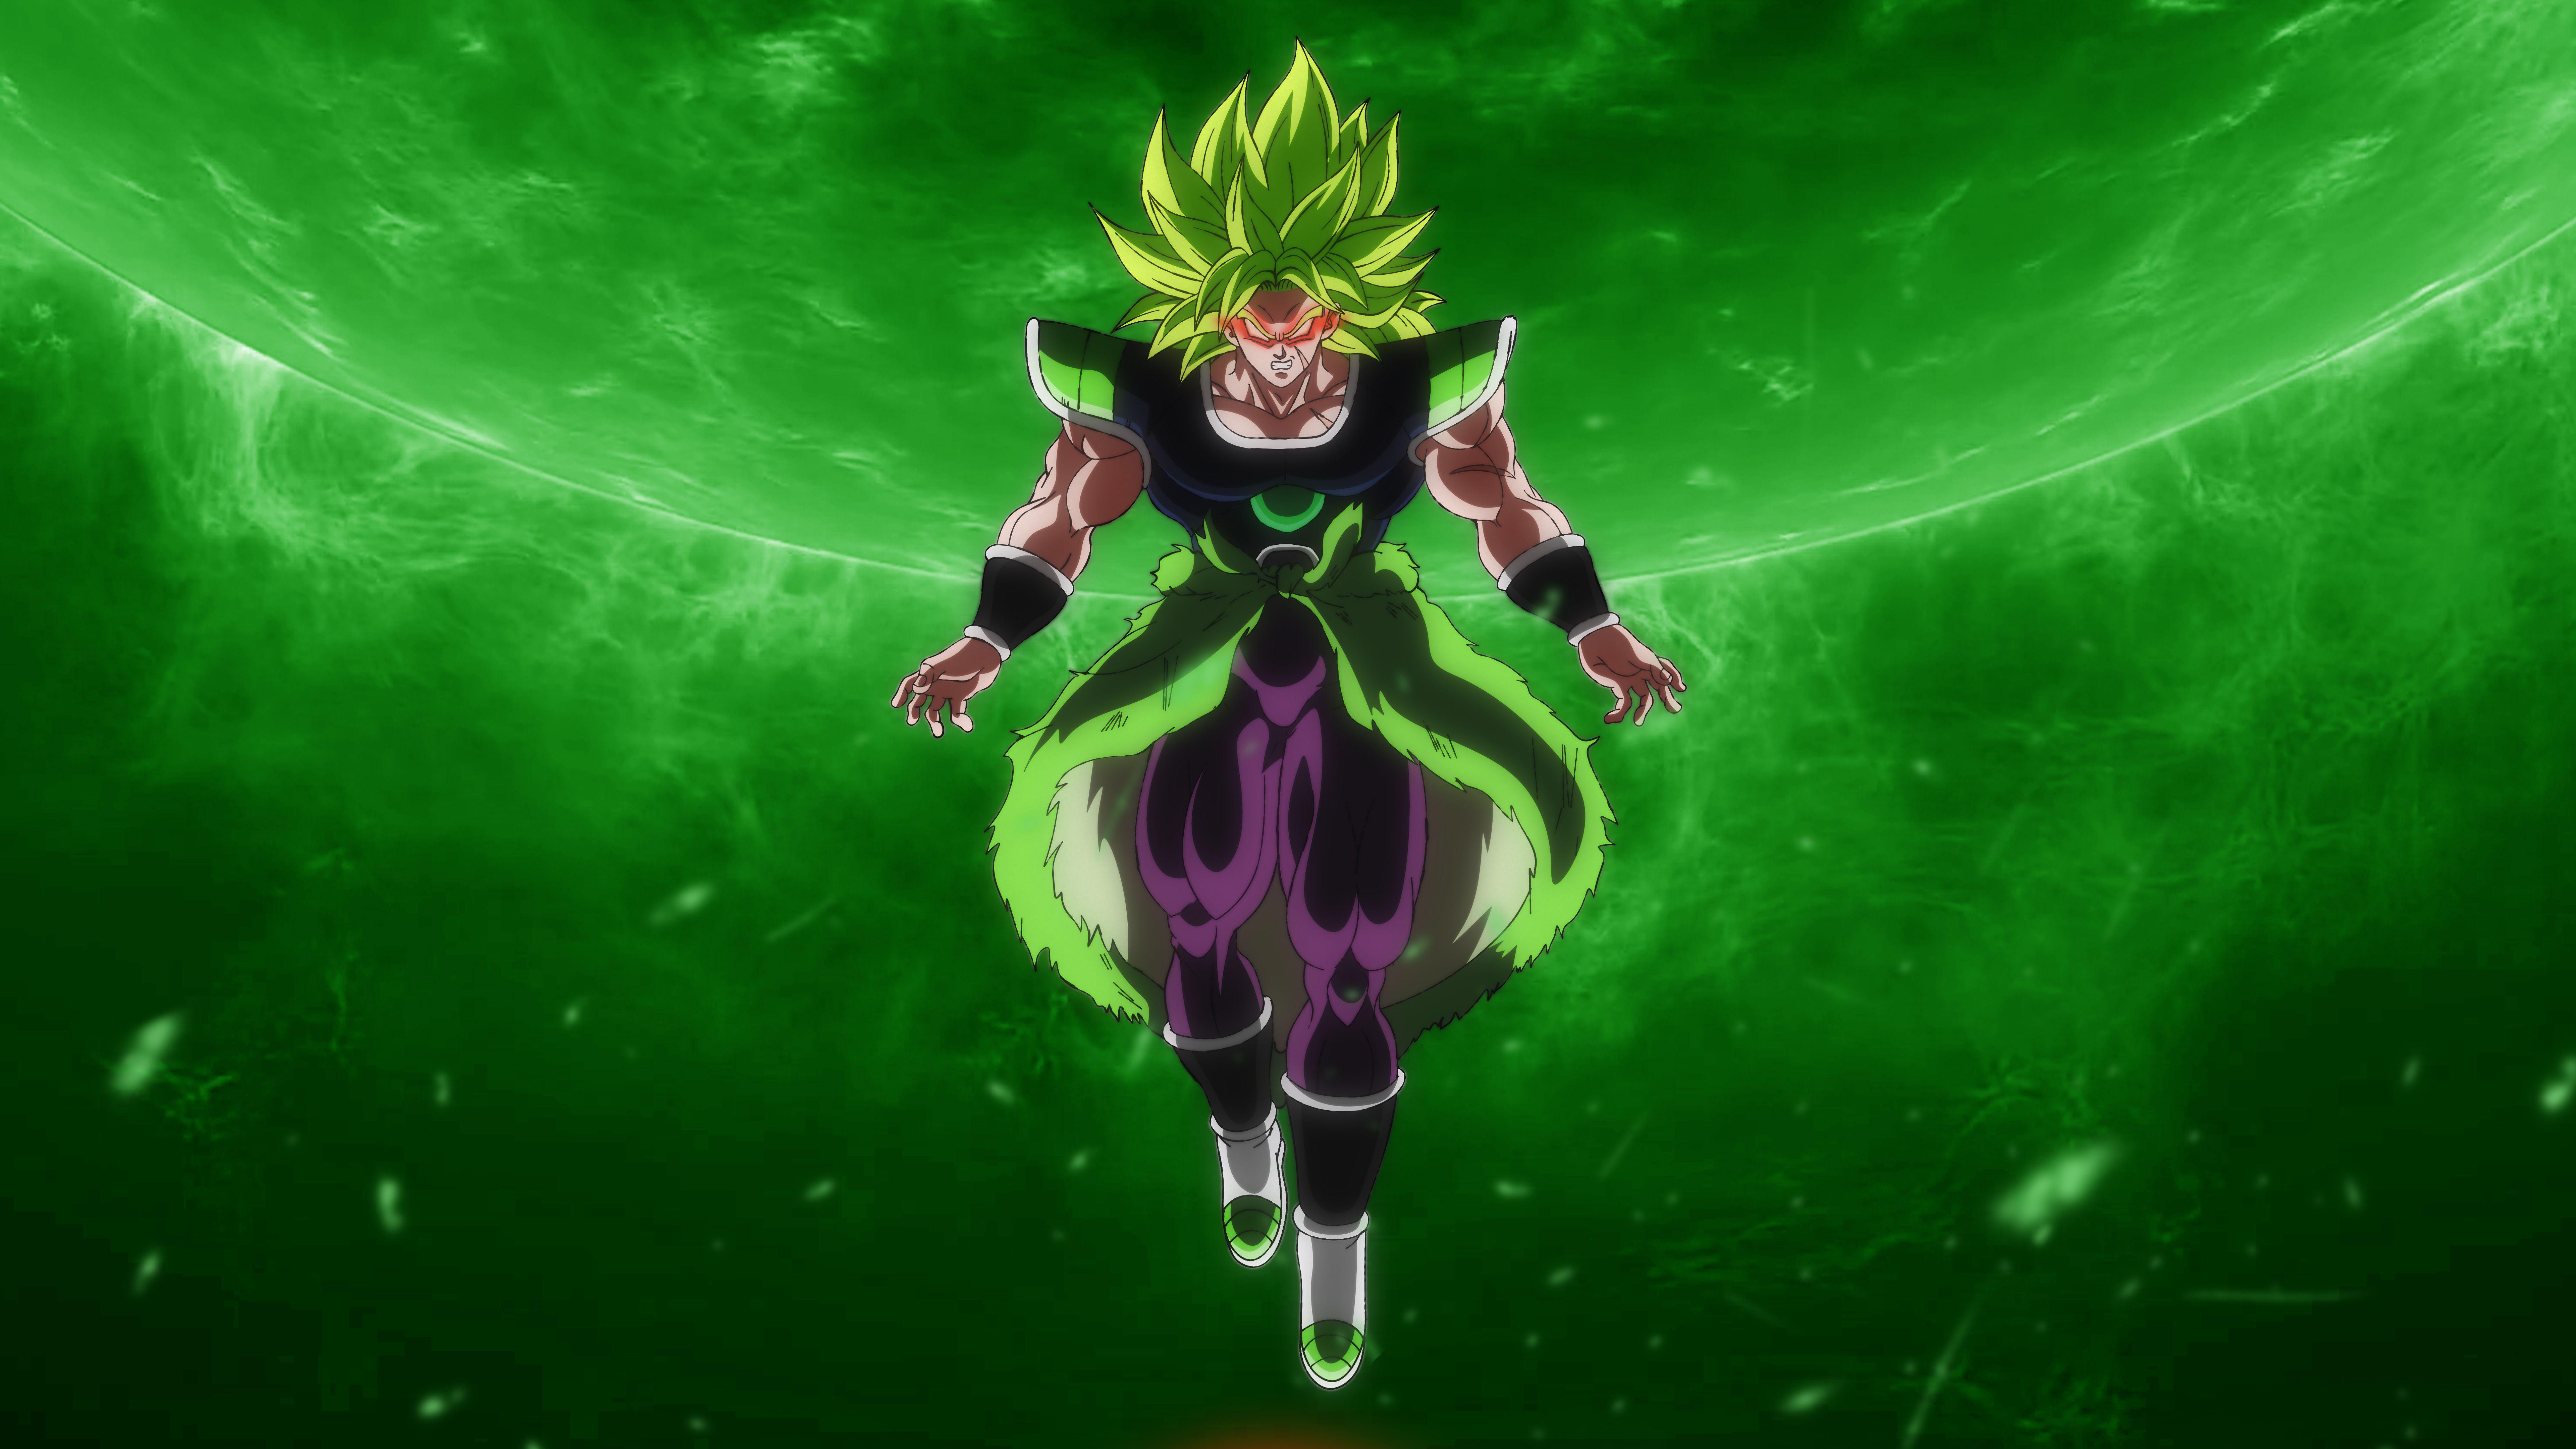 Broly Legendary Super Saiyan Dragon Ball Super Broly Movie 8k